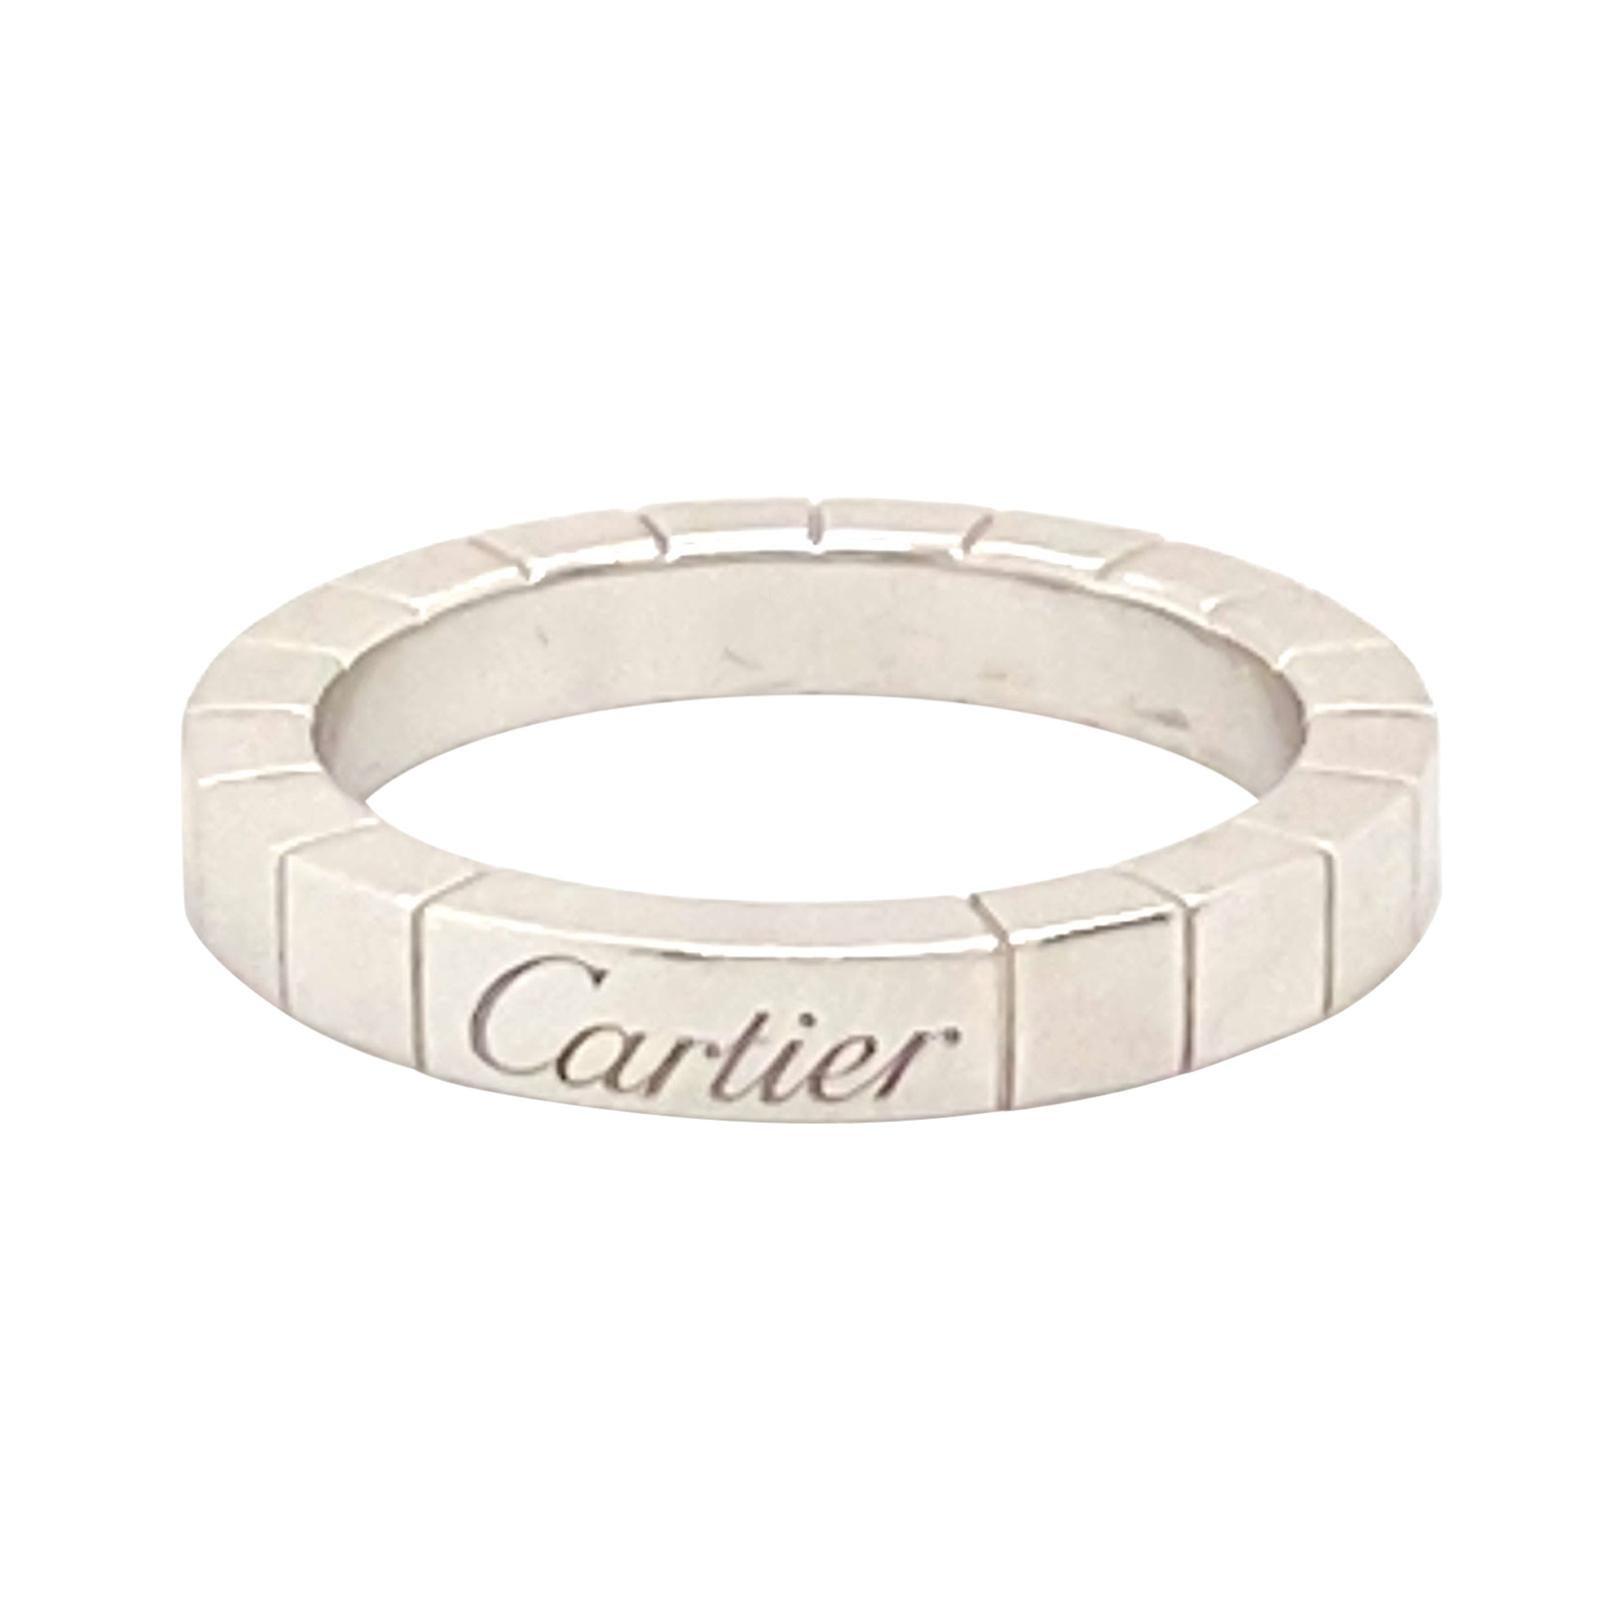 18k White Gold Cartier Ring